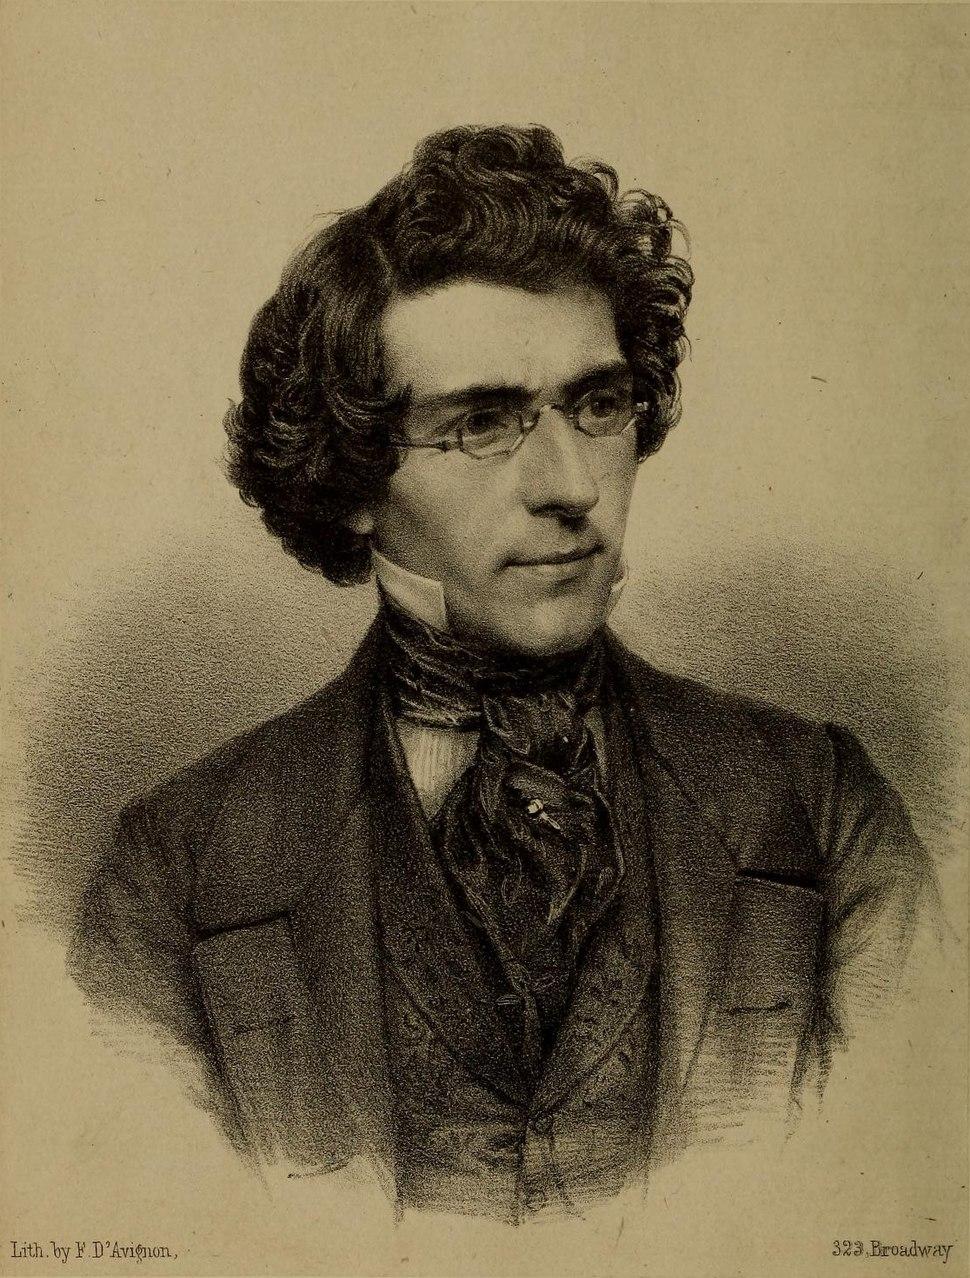 Mathew B. Brady 1851